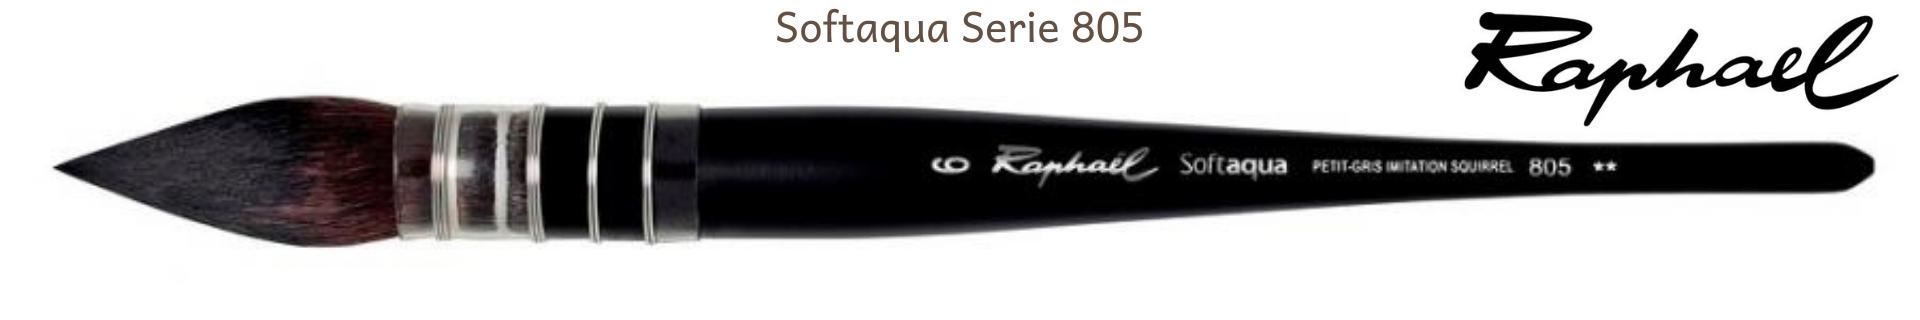 Raphael Softaqua 805 Tondi